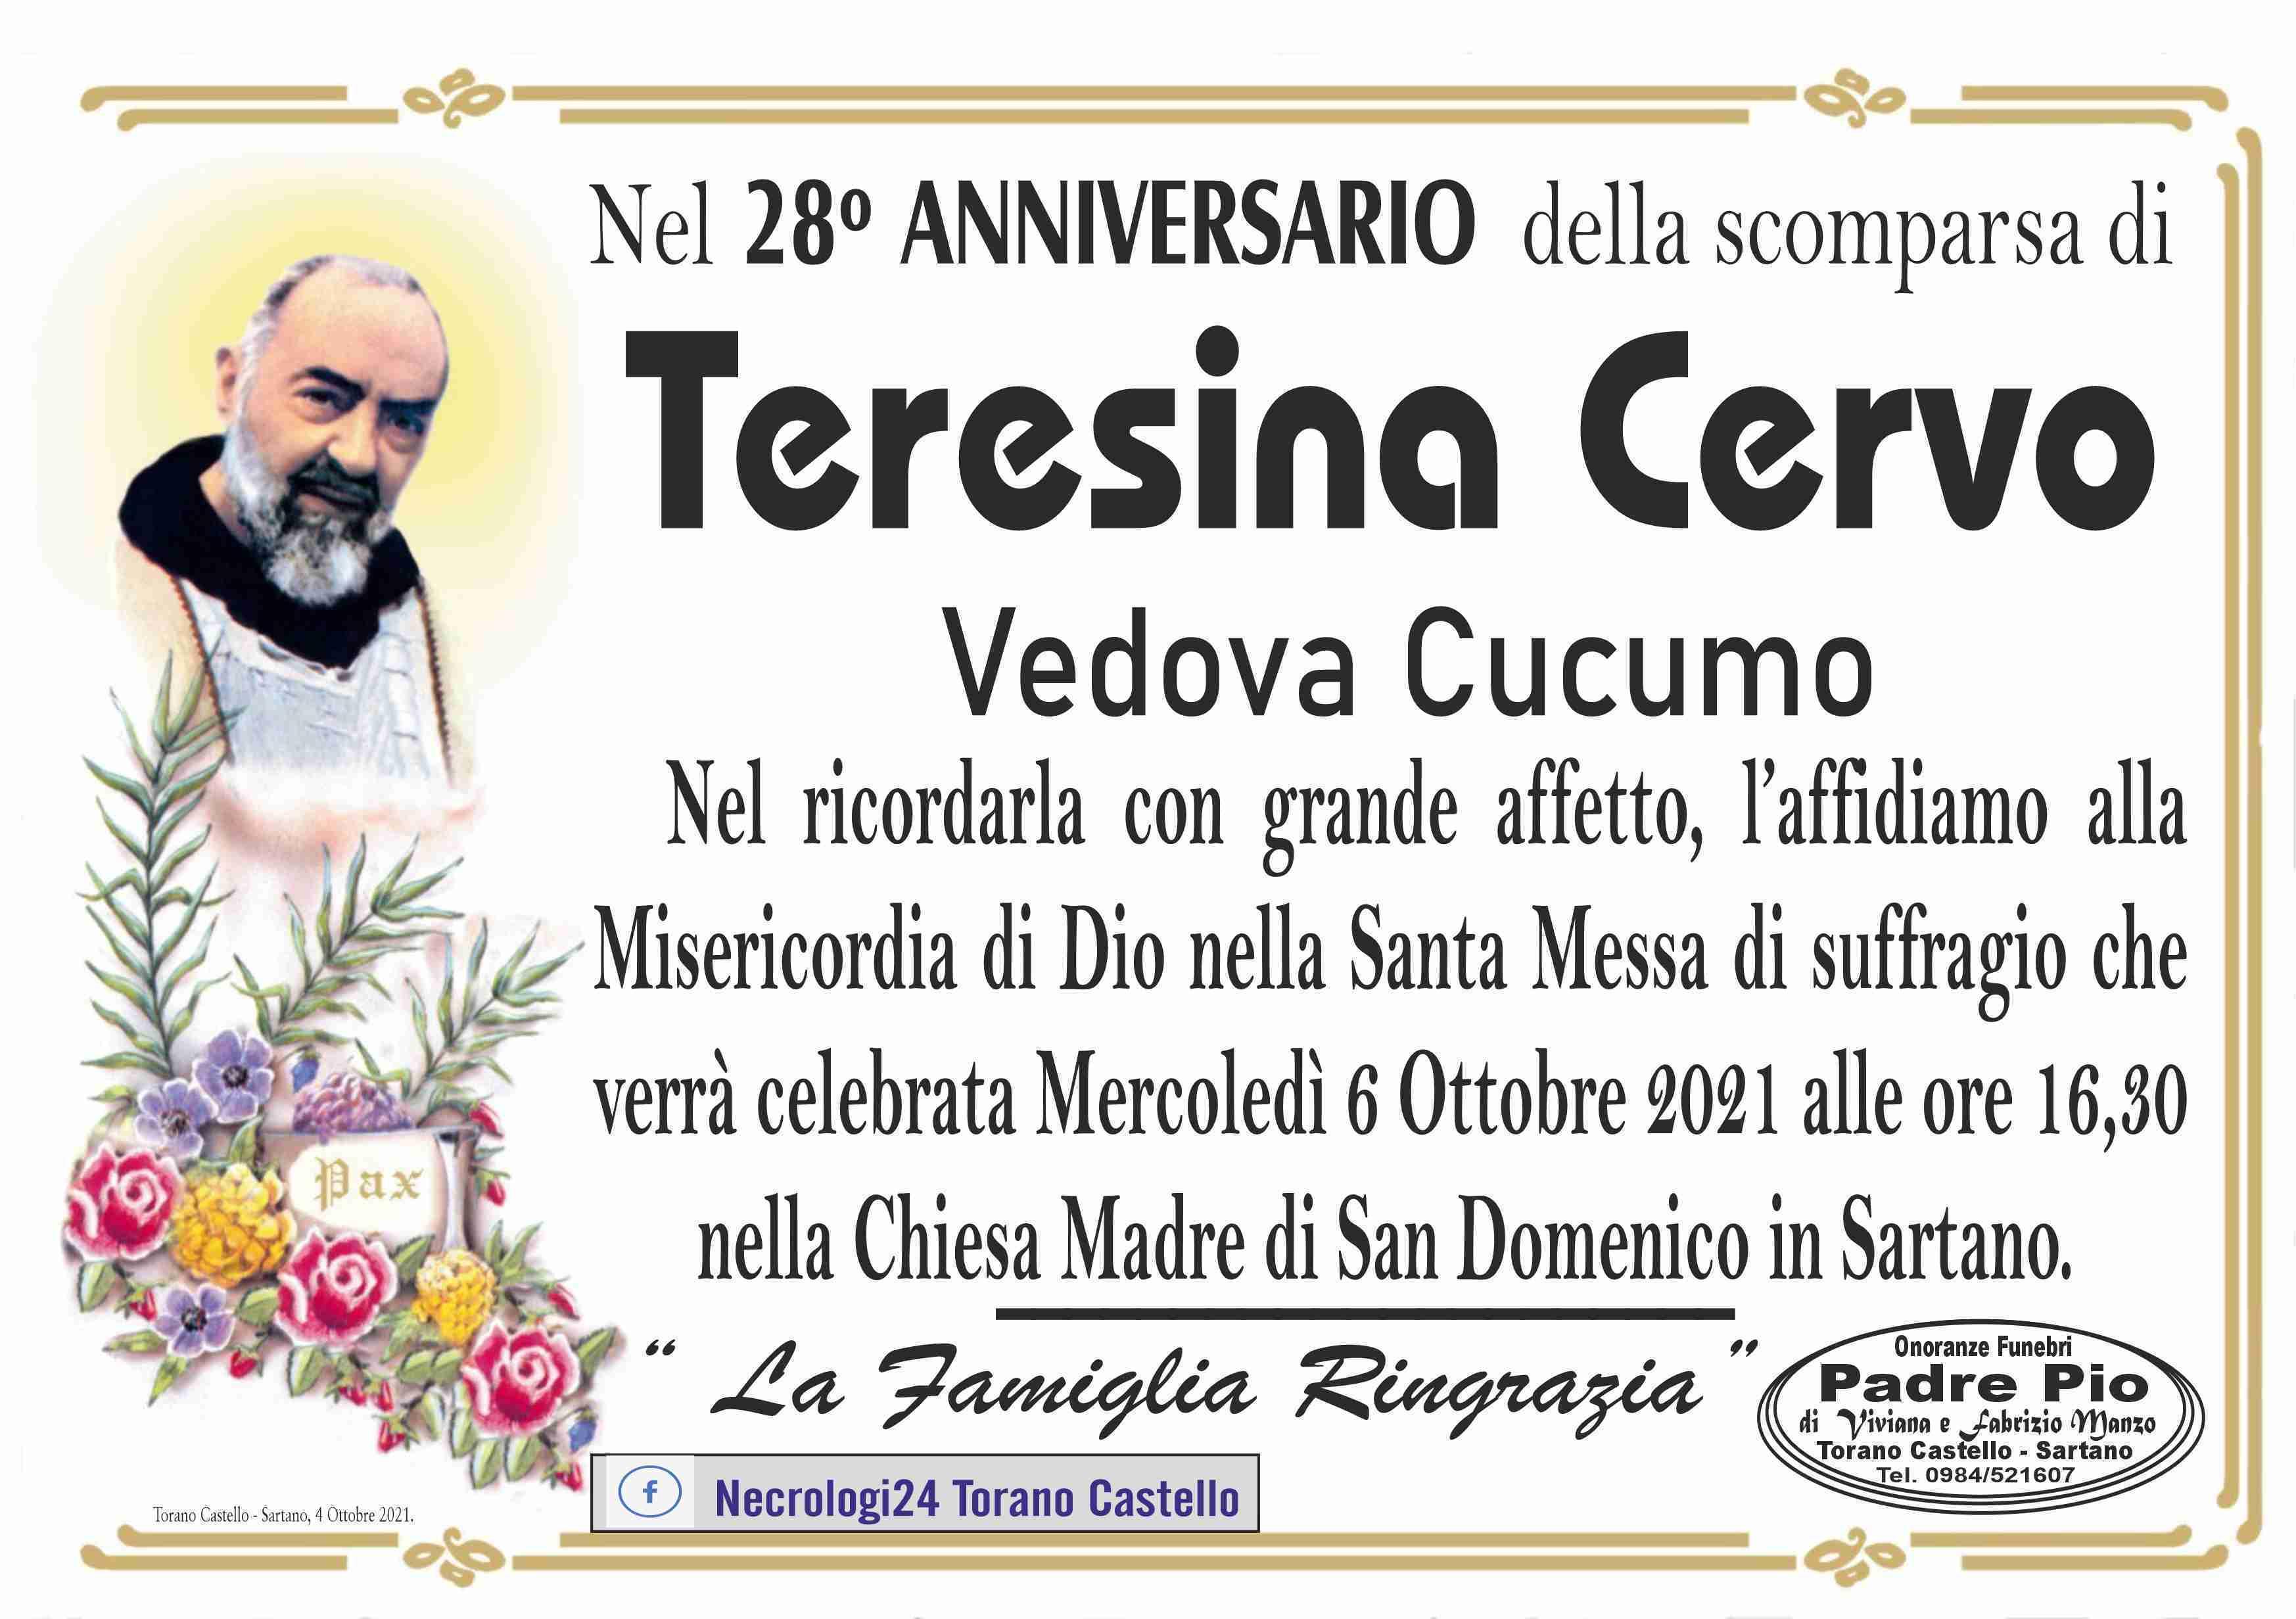 Teresina Cervo